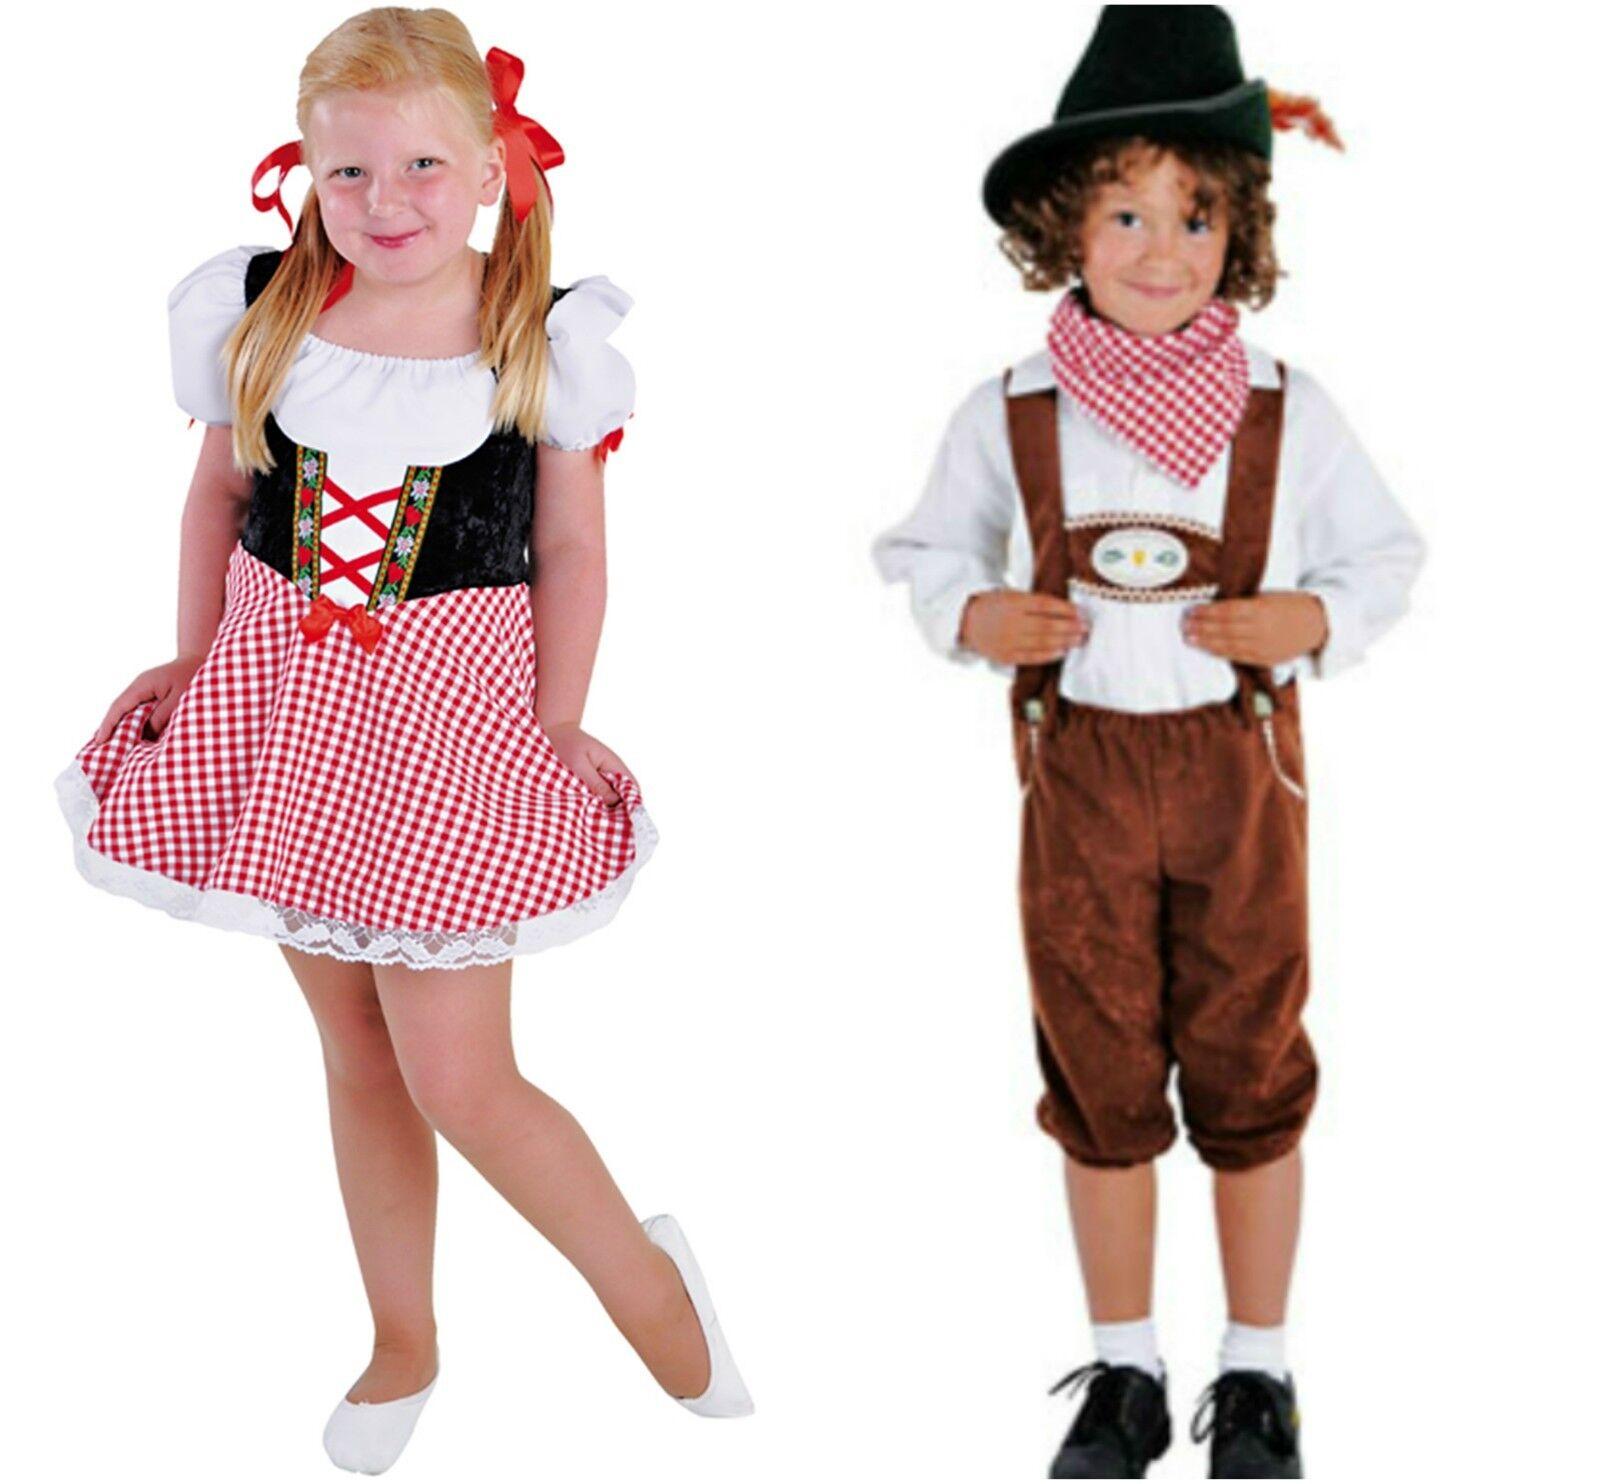 Description Summary. Kids - Hansel u0026 Gretel  Austrian / Oktoberfest Costumes ...  sc 1 st  eBay & Kids - Hansel u0026 Gretel  Austrian / Oktoberfest Costumes - ages 4 ...